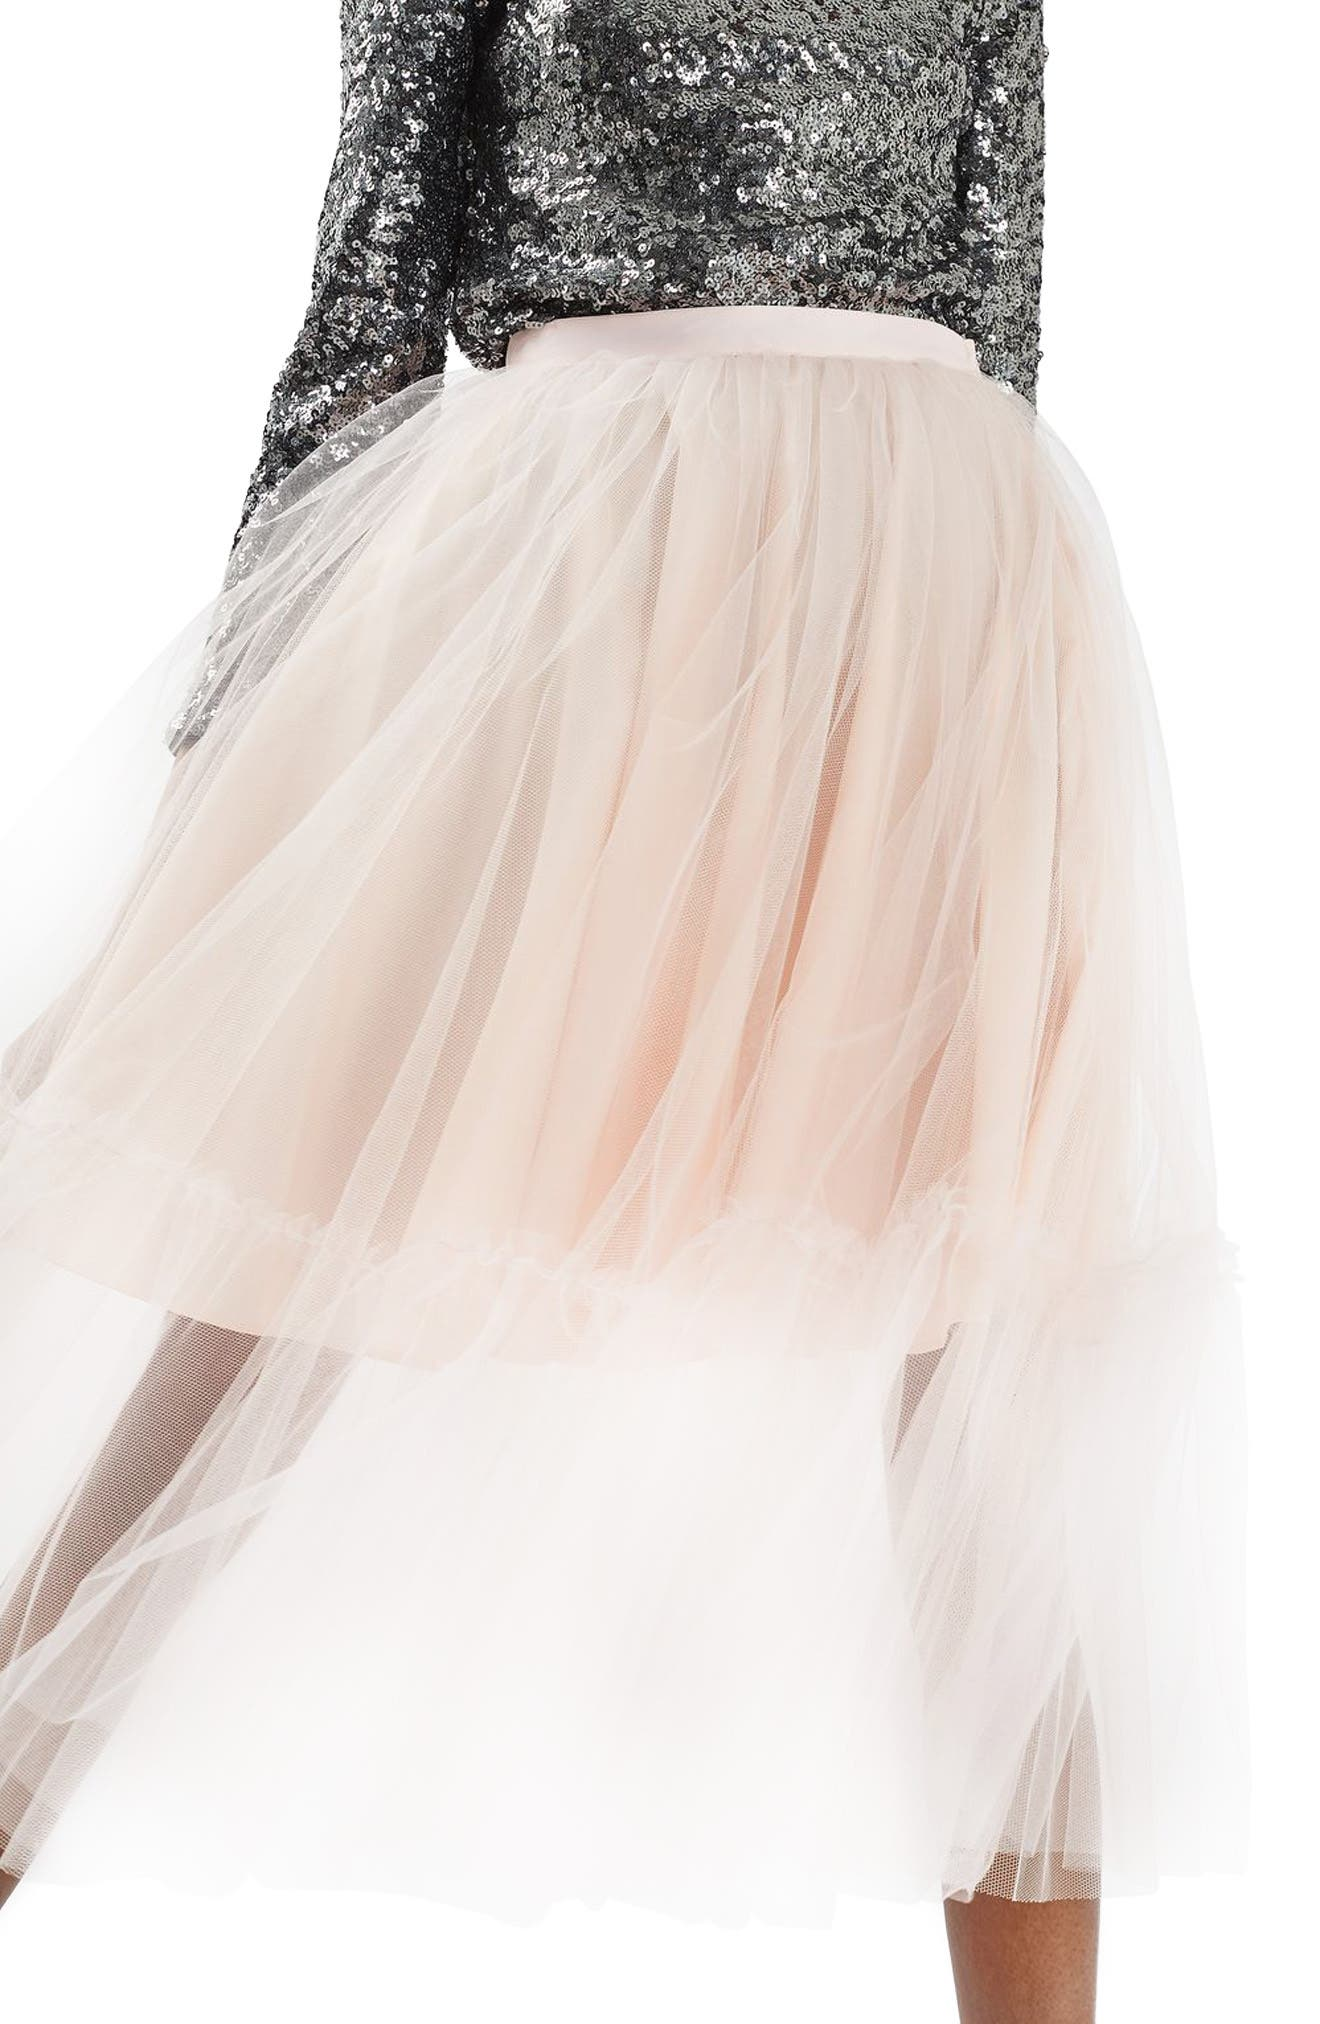 Main Image - Topshop Tutu Tulle Skirt